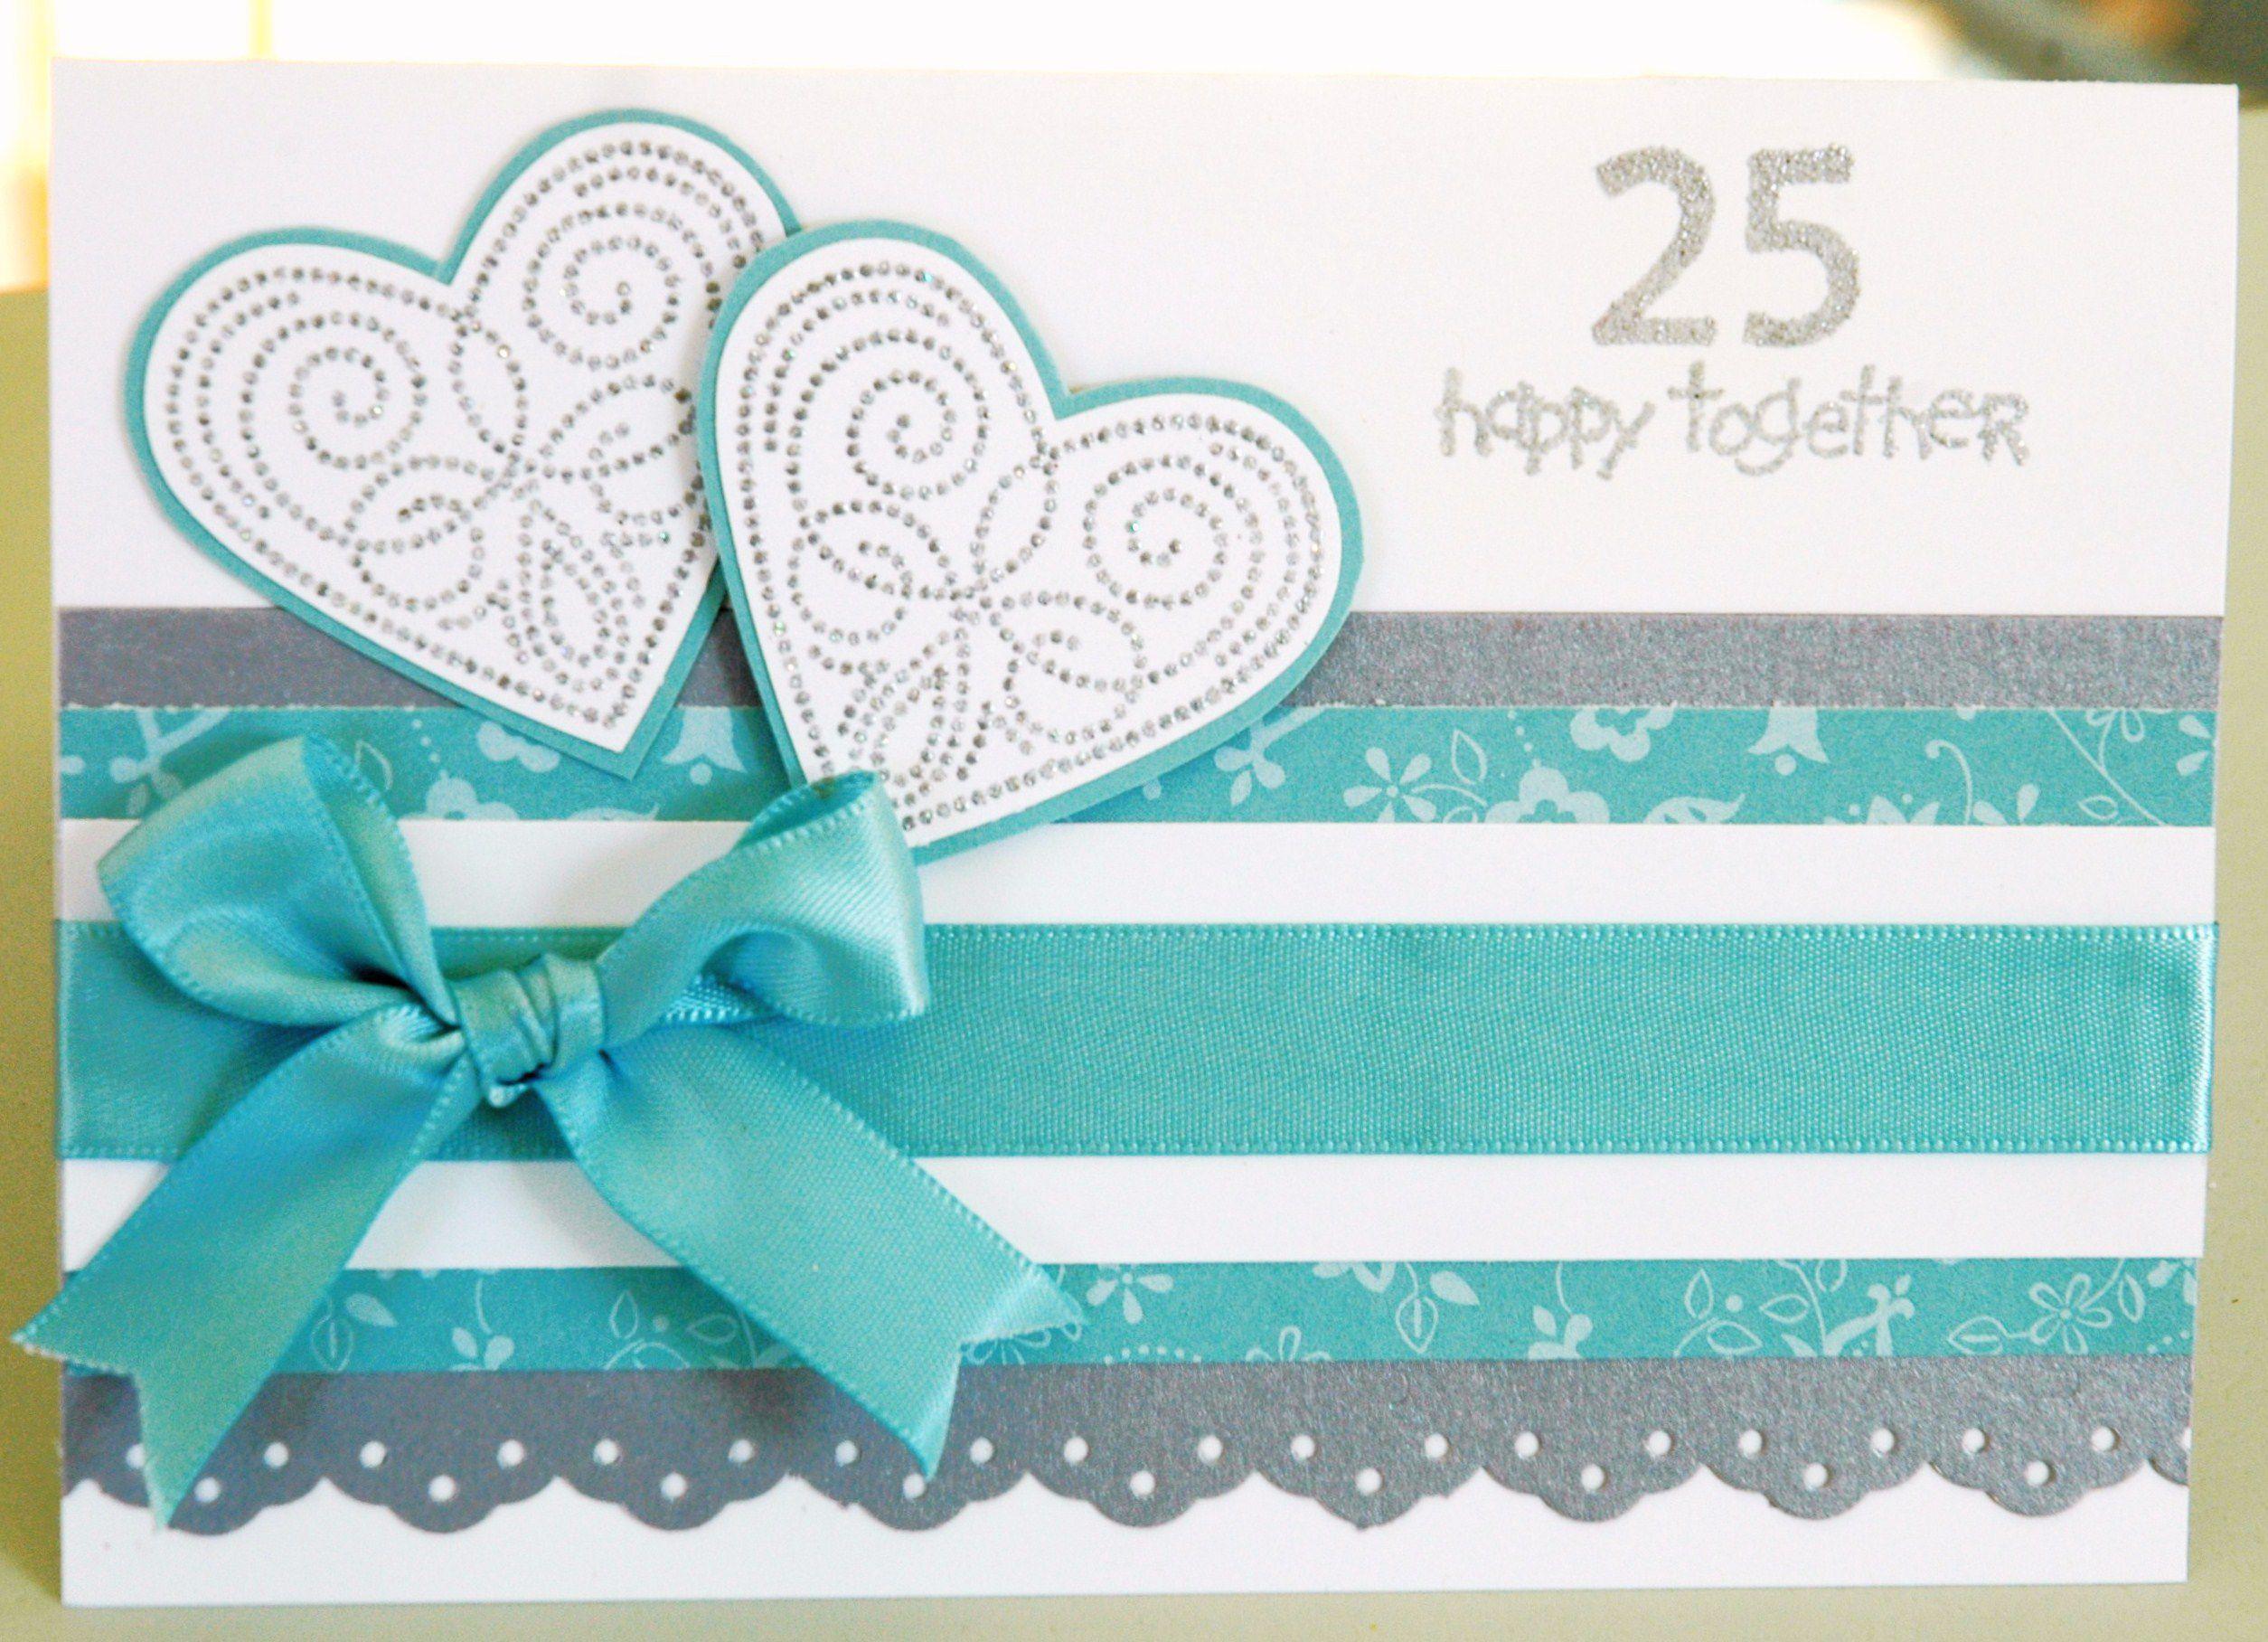 Download 25th Wedding Anniversary Wallpaper Gallery Wedding Anniversary Cards Free Wedding Anniversary Invitations Anniversary Invitations